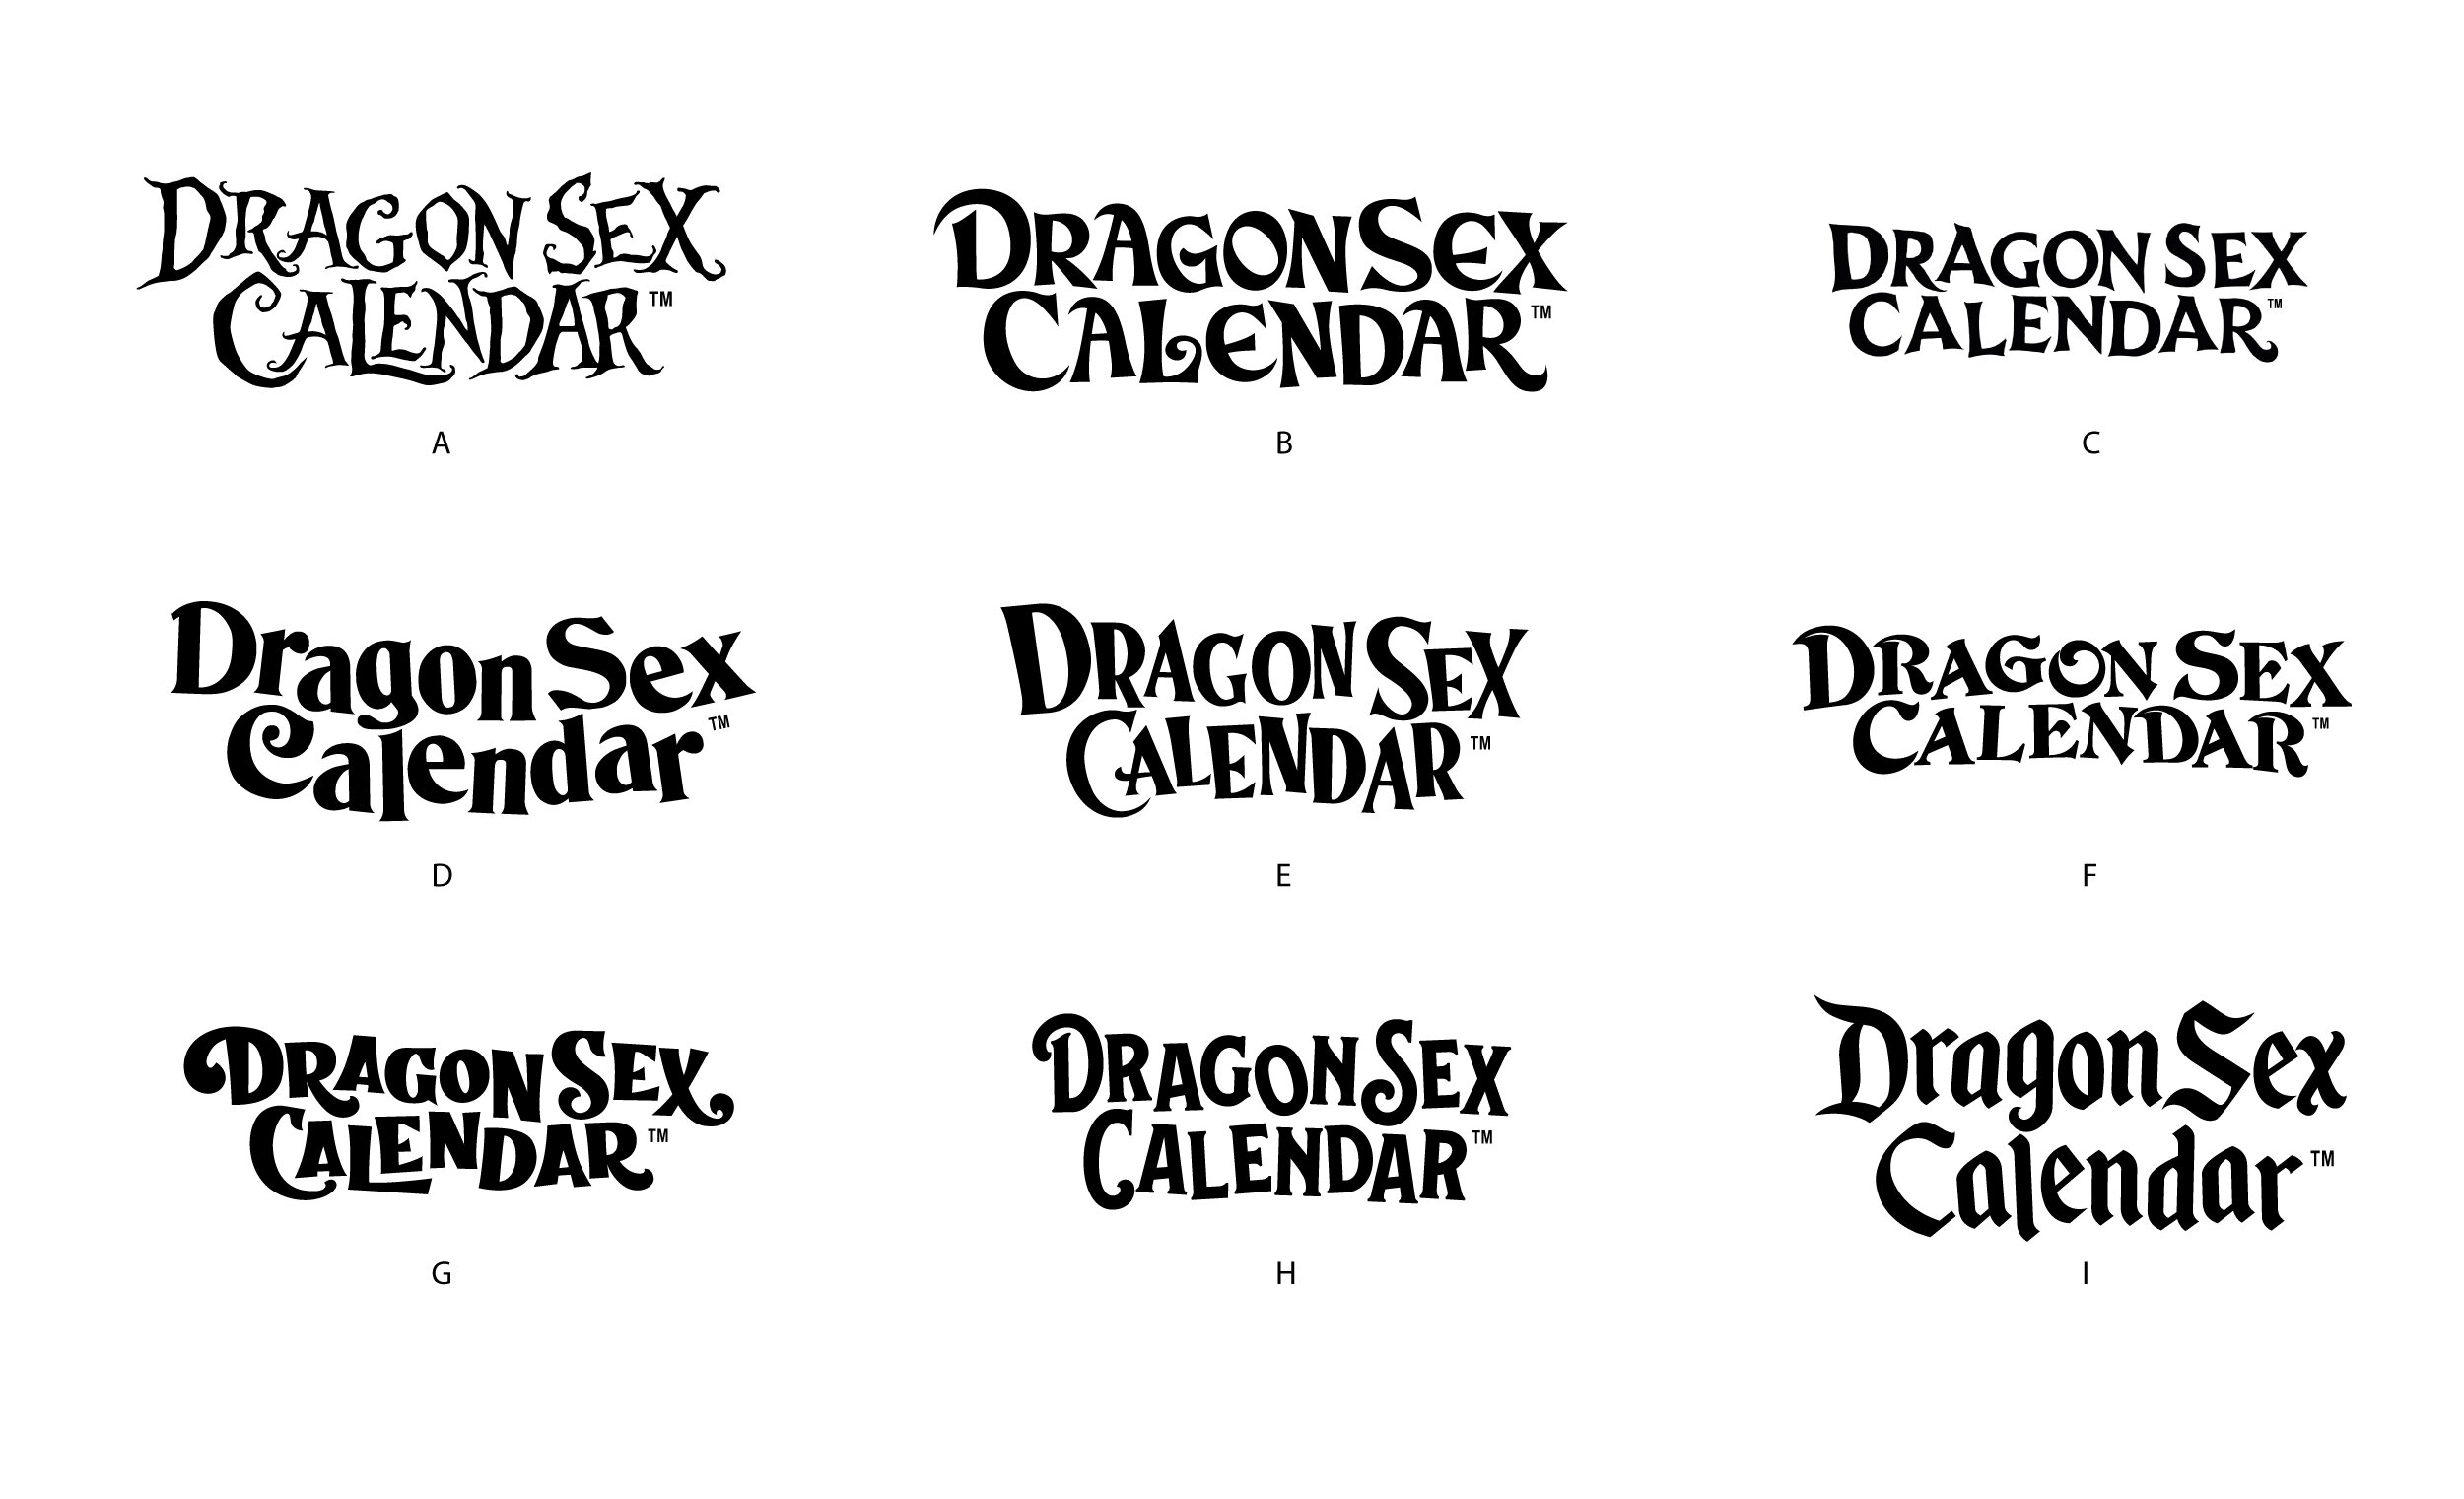 dragonsexcalendar-01.jpg